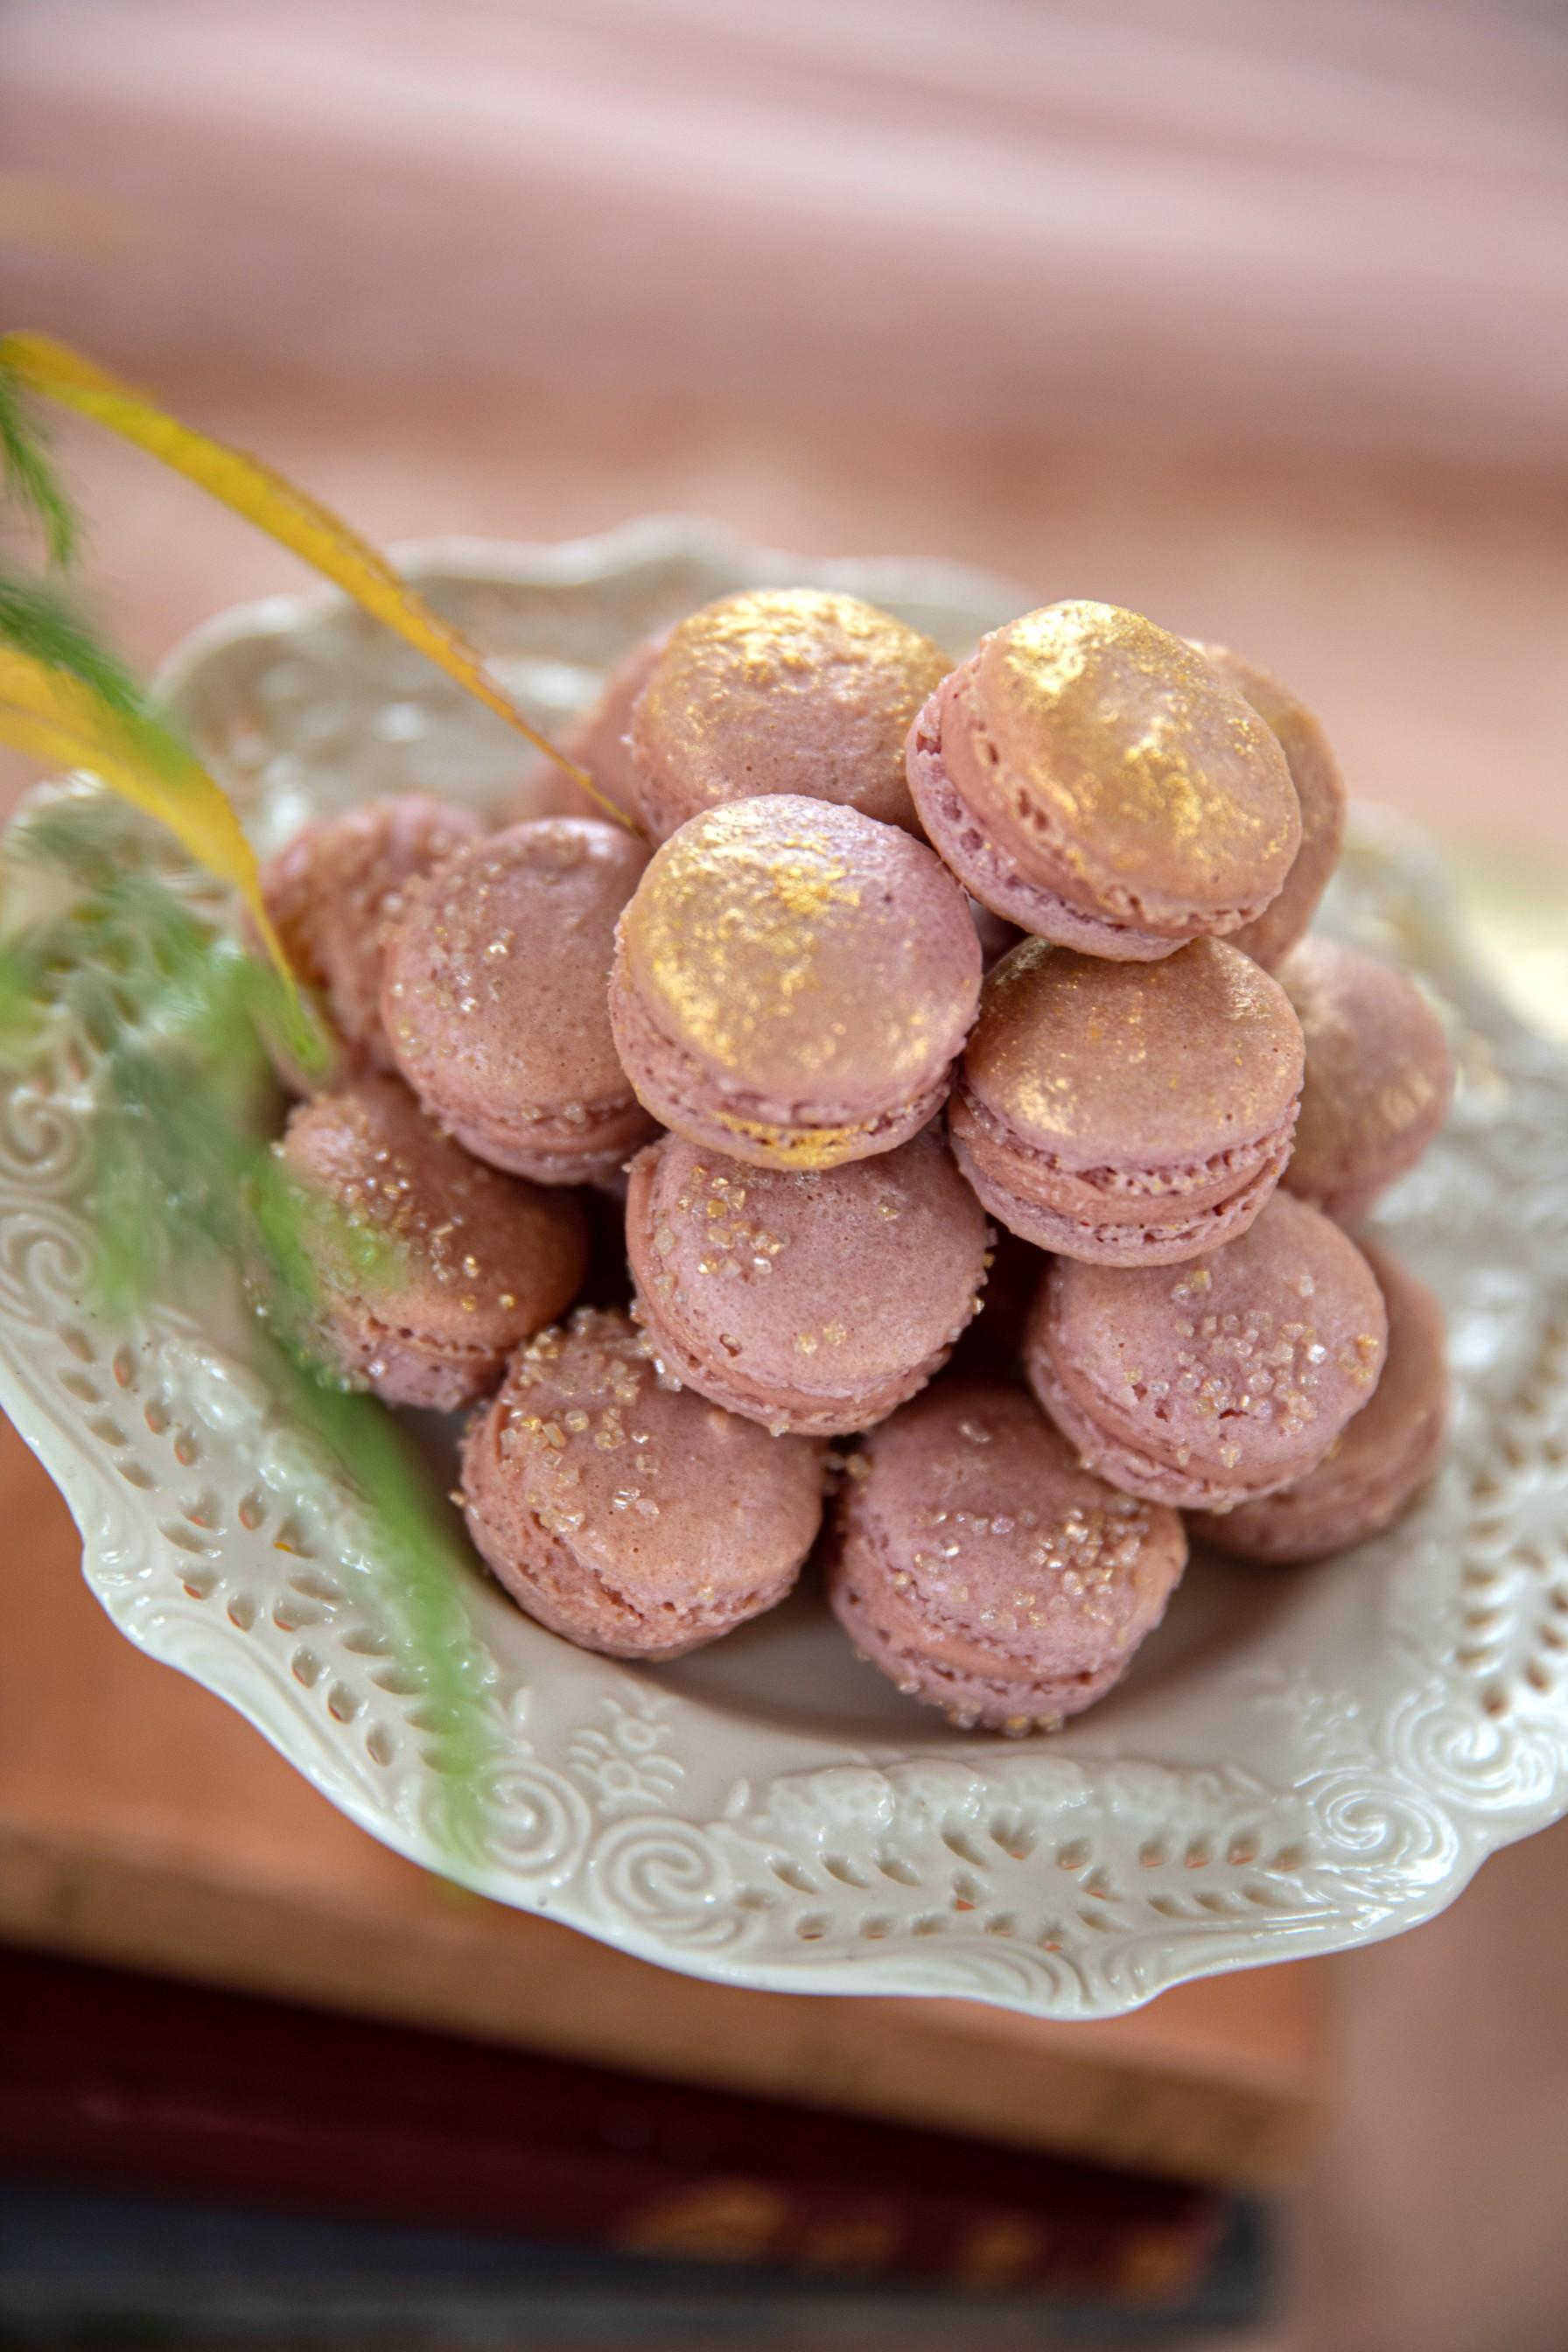 wedding macarons - pink macarons - wedding dessert table